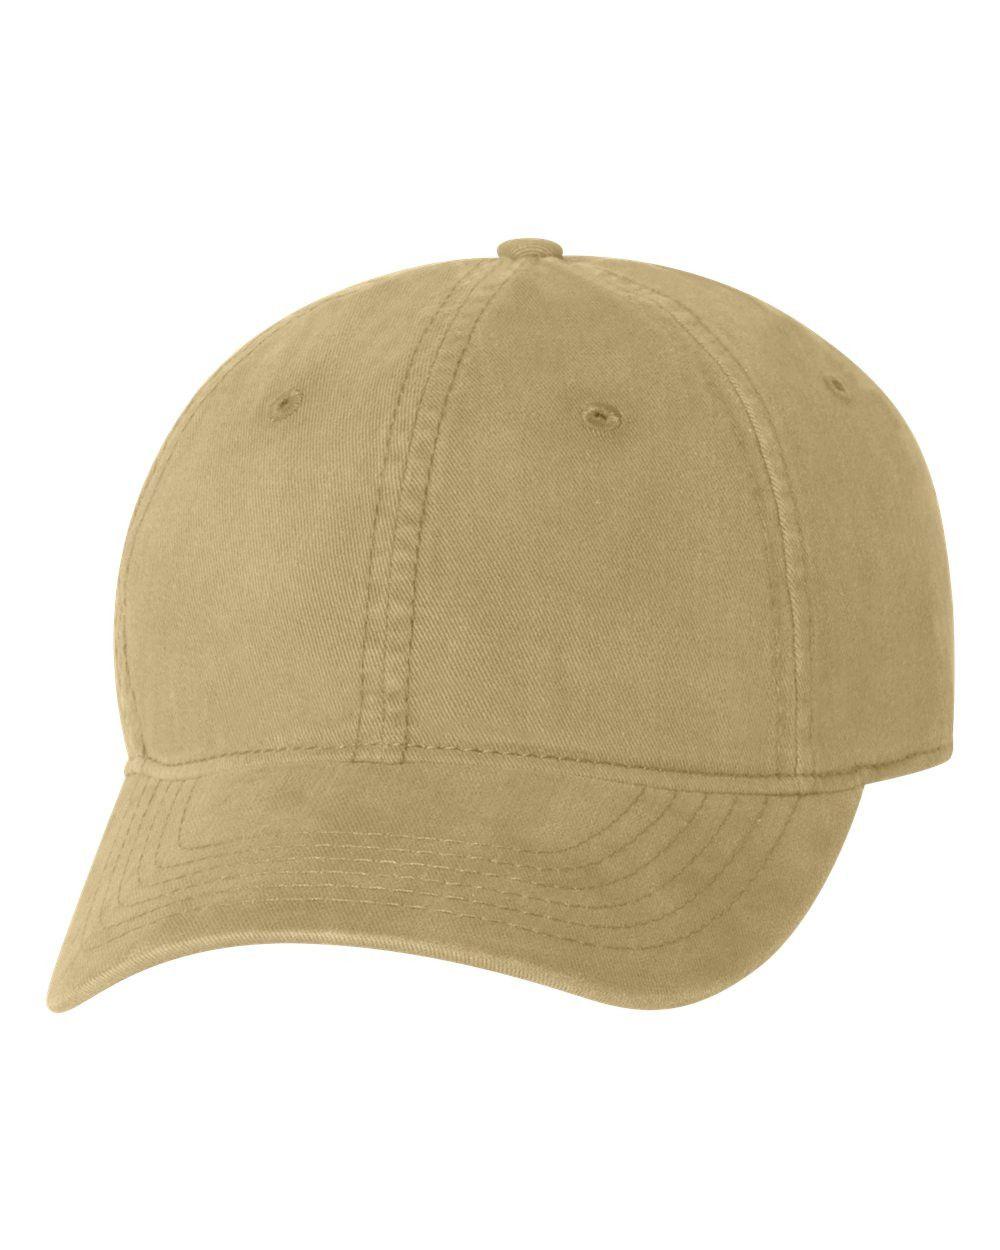 Authentic Headwear - ''The Cozy'' Unstructured Cap - AH35 Khaki